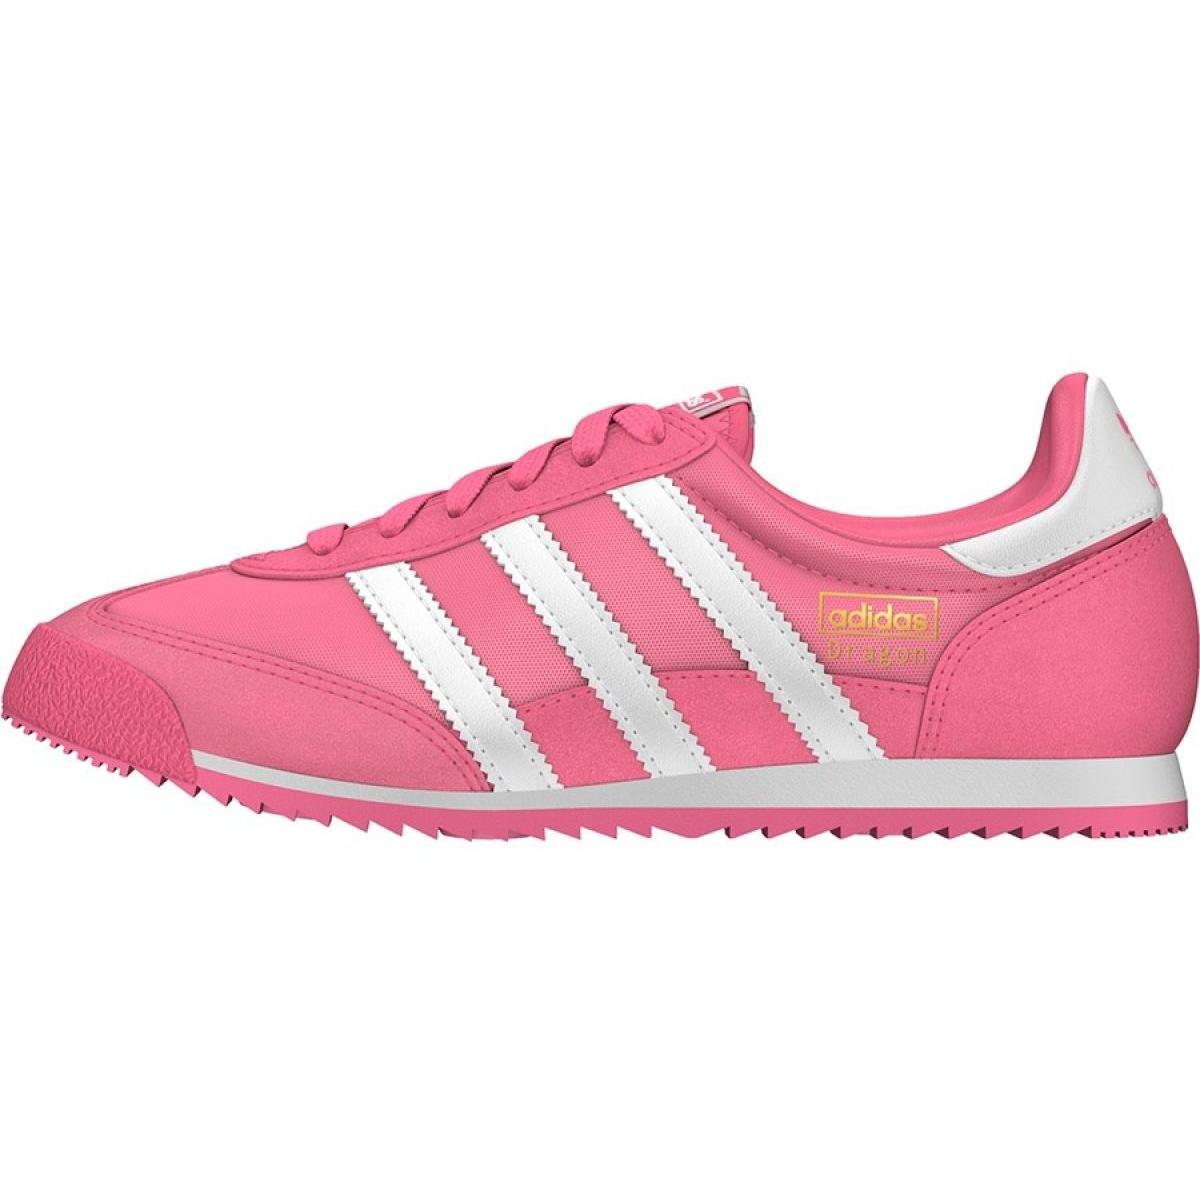 adidas Originals Dragon OG Shoe | Sneakers | Shoes | Men's